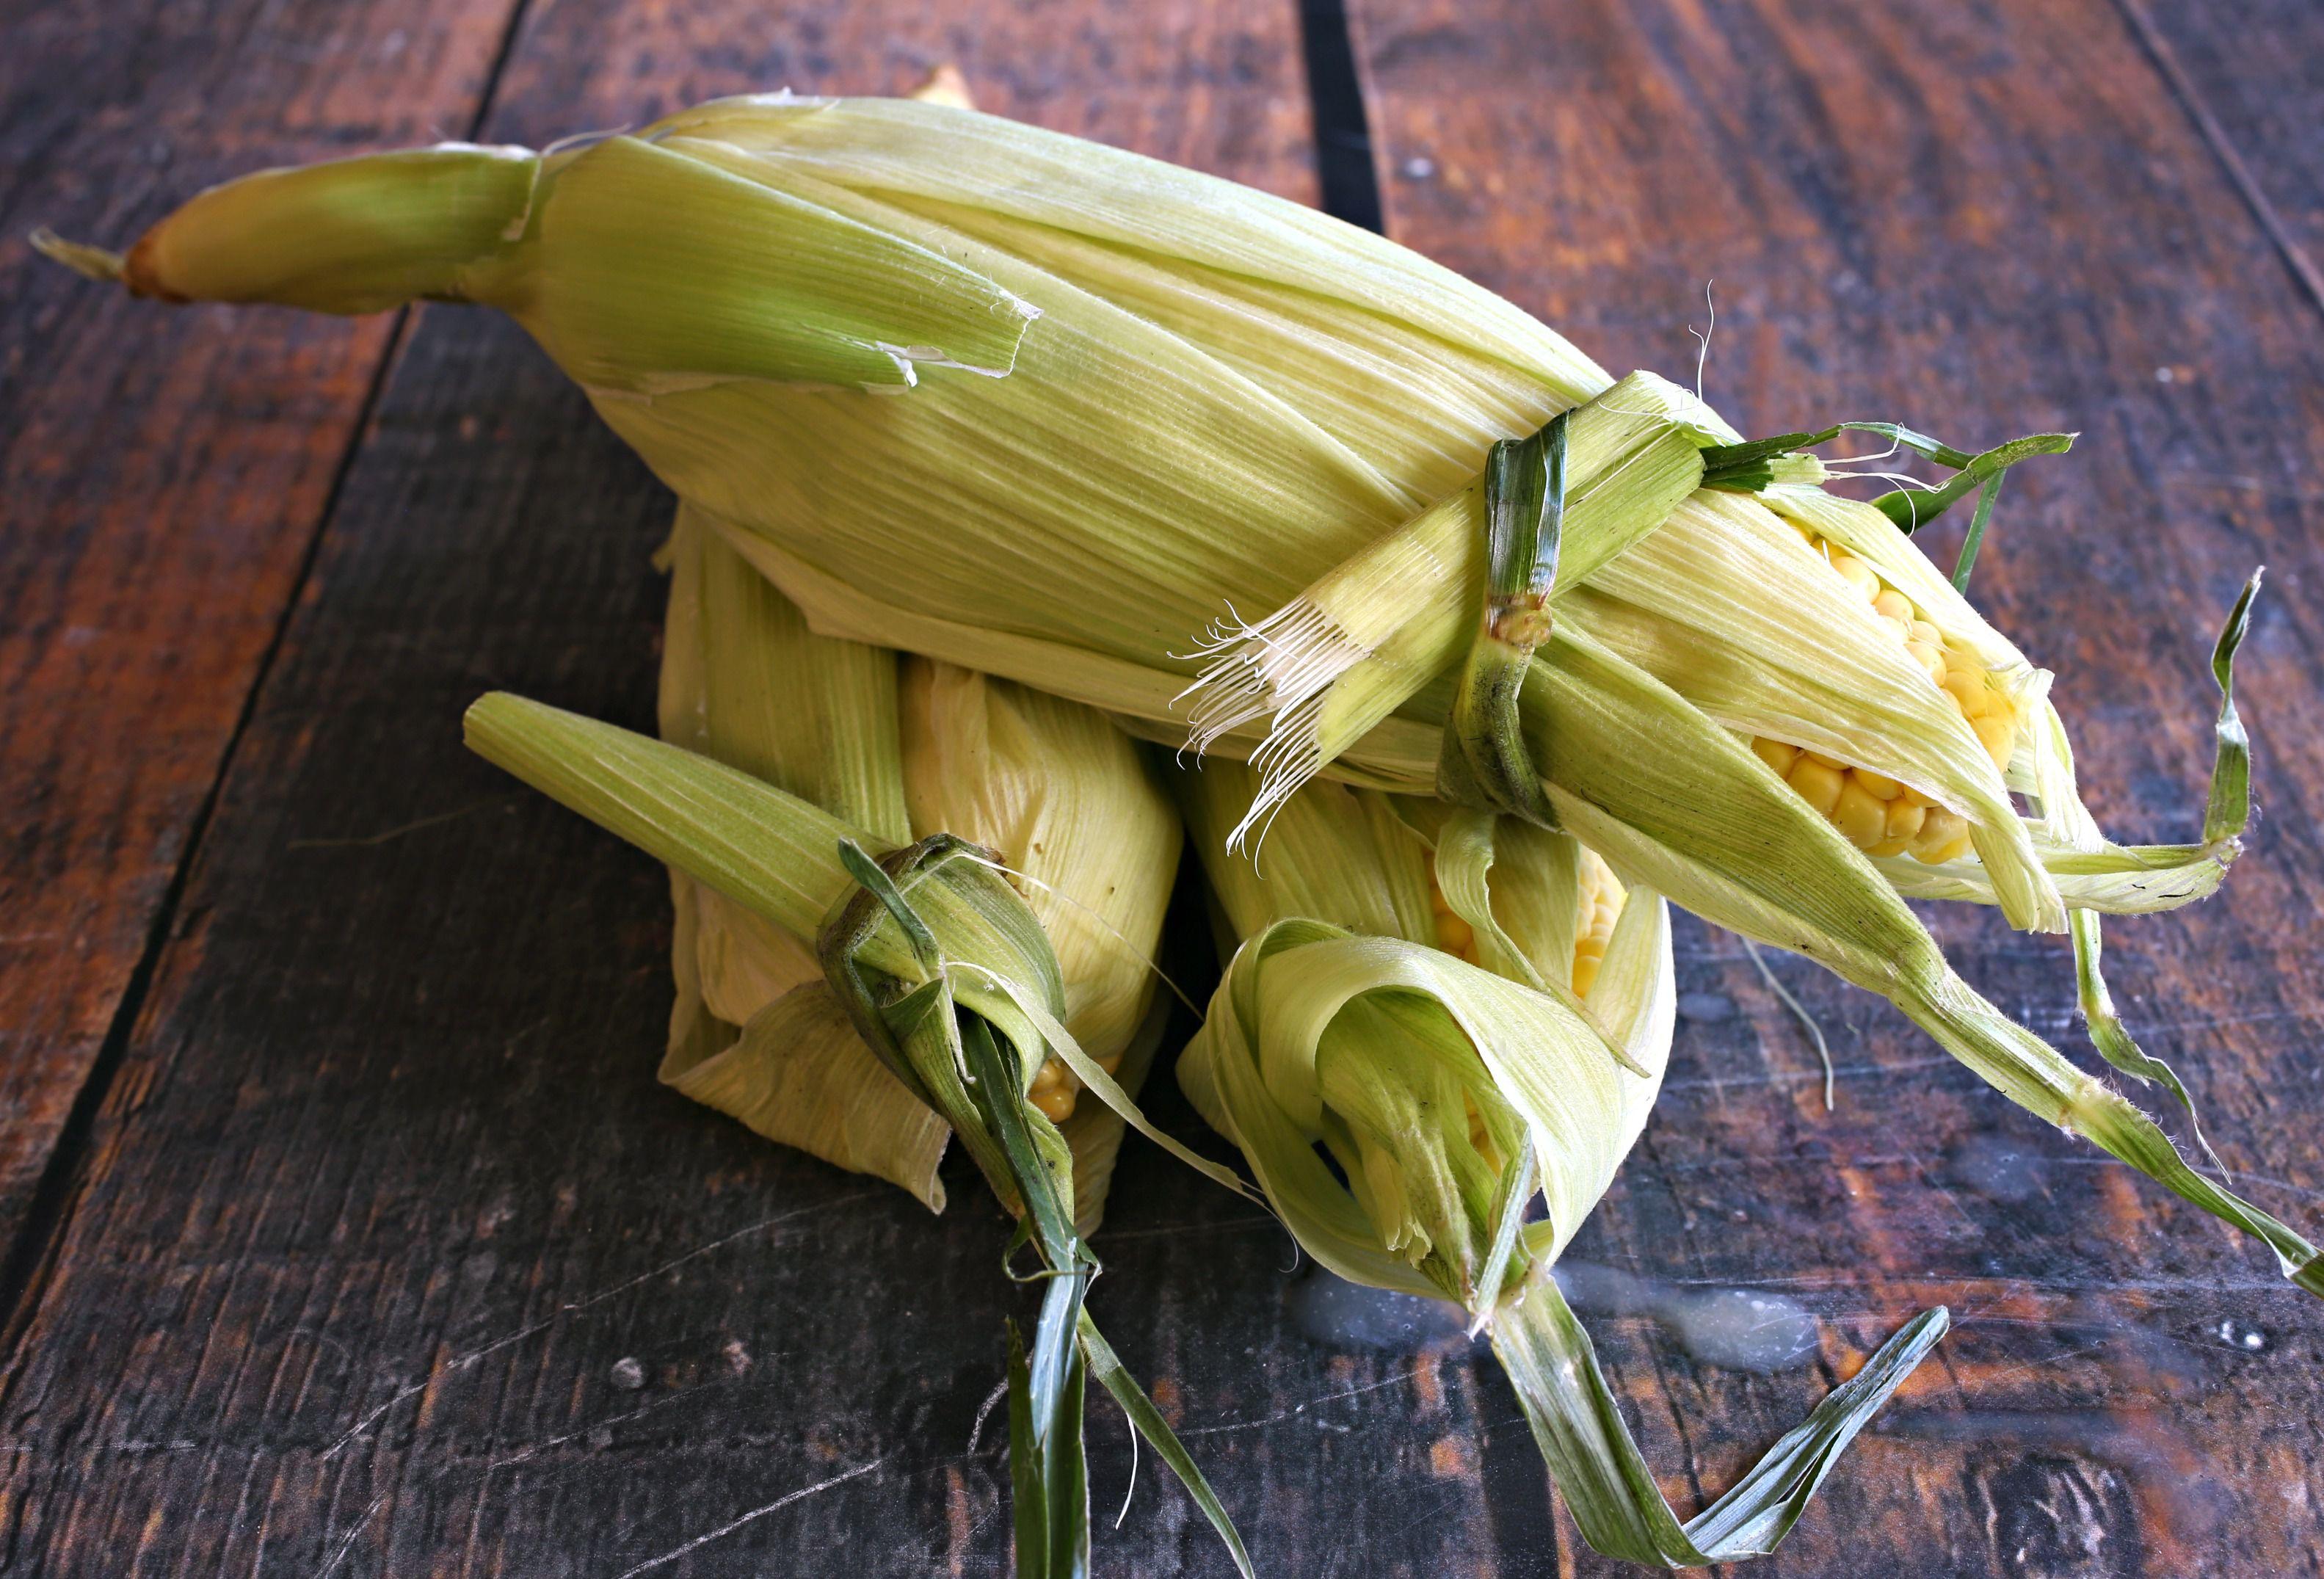 Retied corn